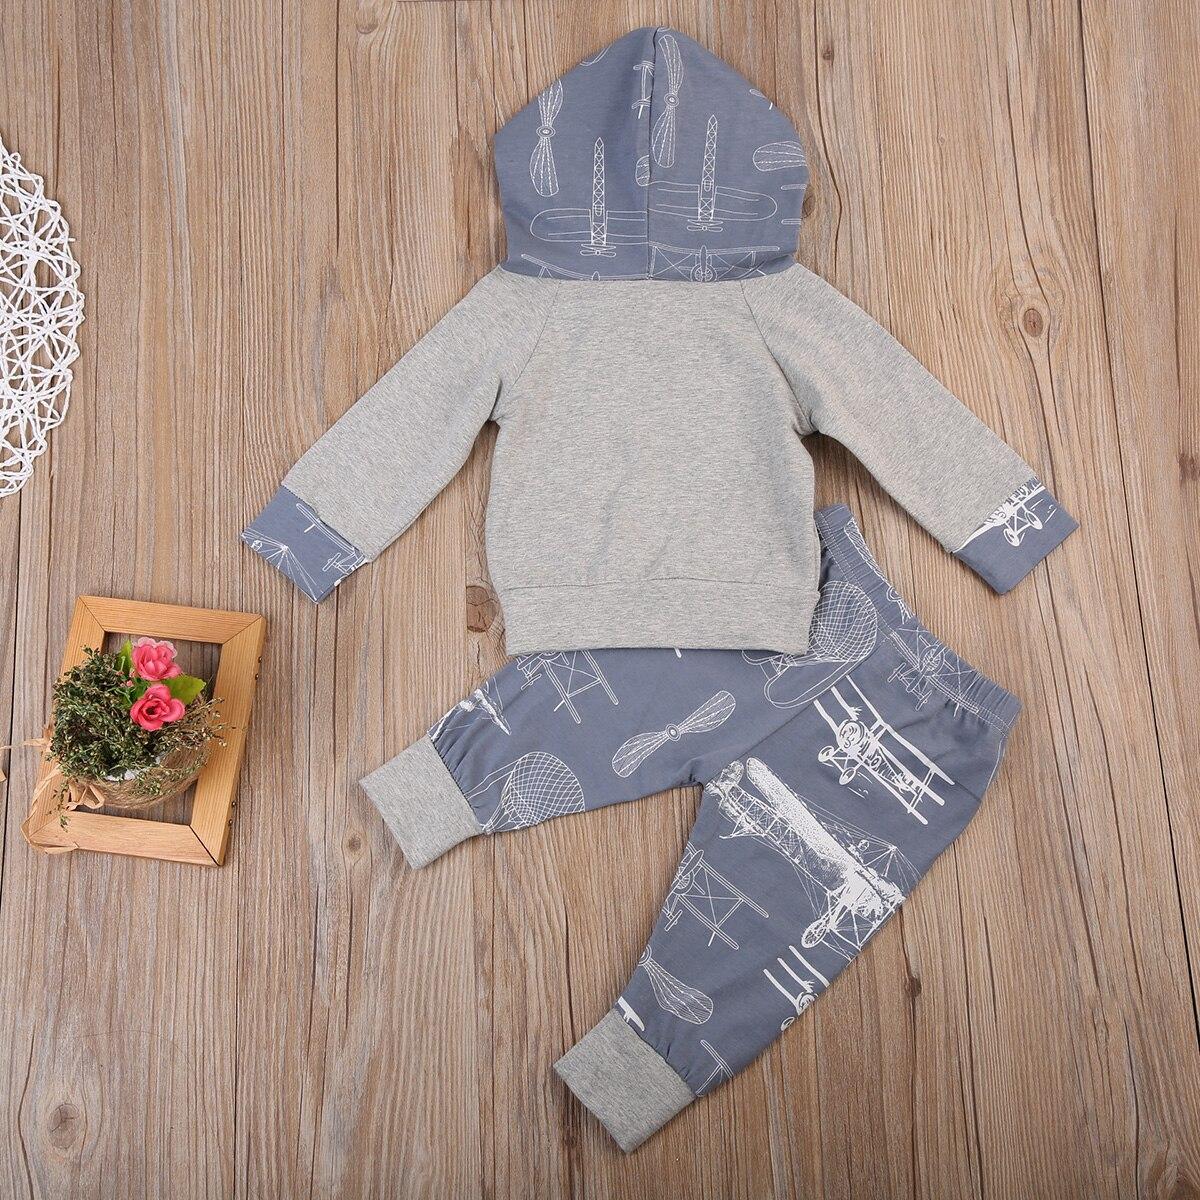 d41bdc178f2d Cute Infant Kids Baby Boy Girl Autumn Sets Grey Hoodie Sweatshirt+ ...